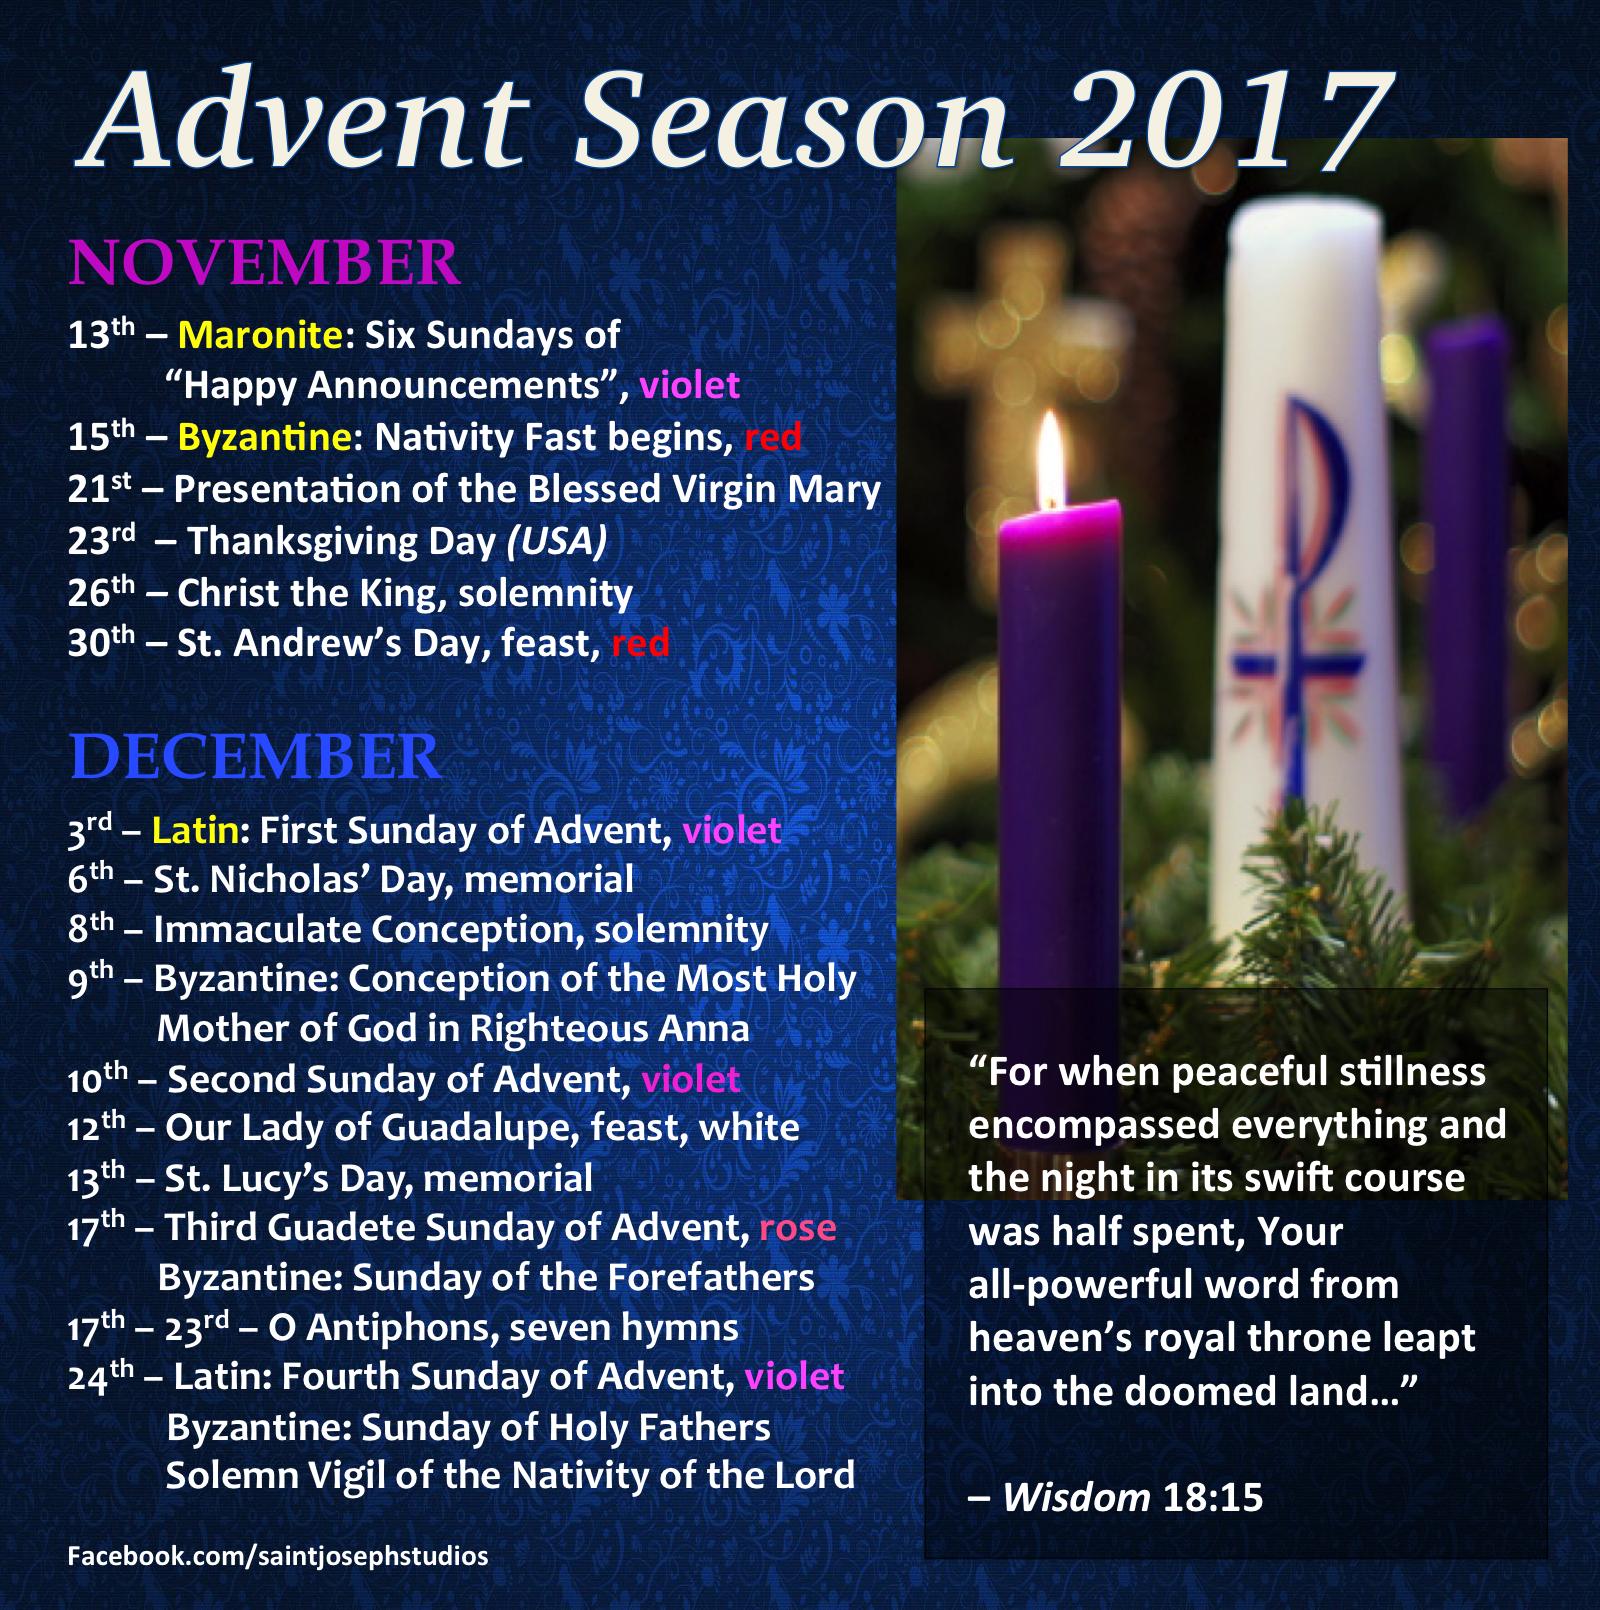 Advent Season 2017 Advent catholic, Advent prayers